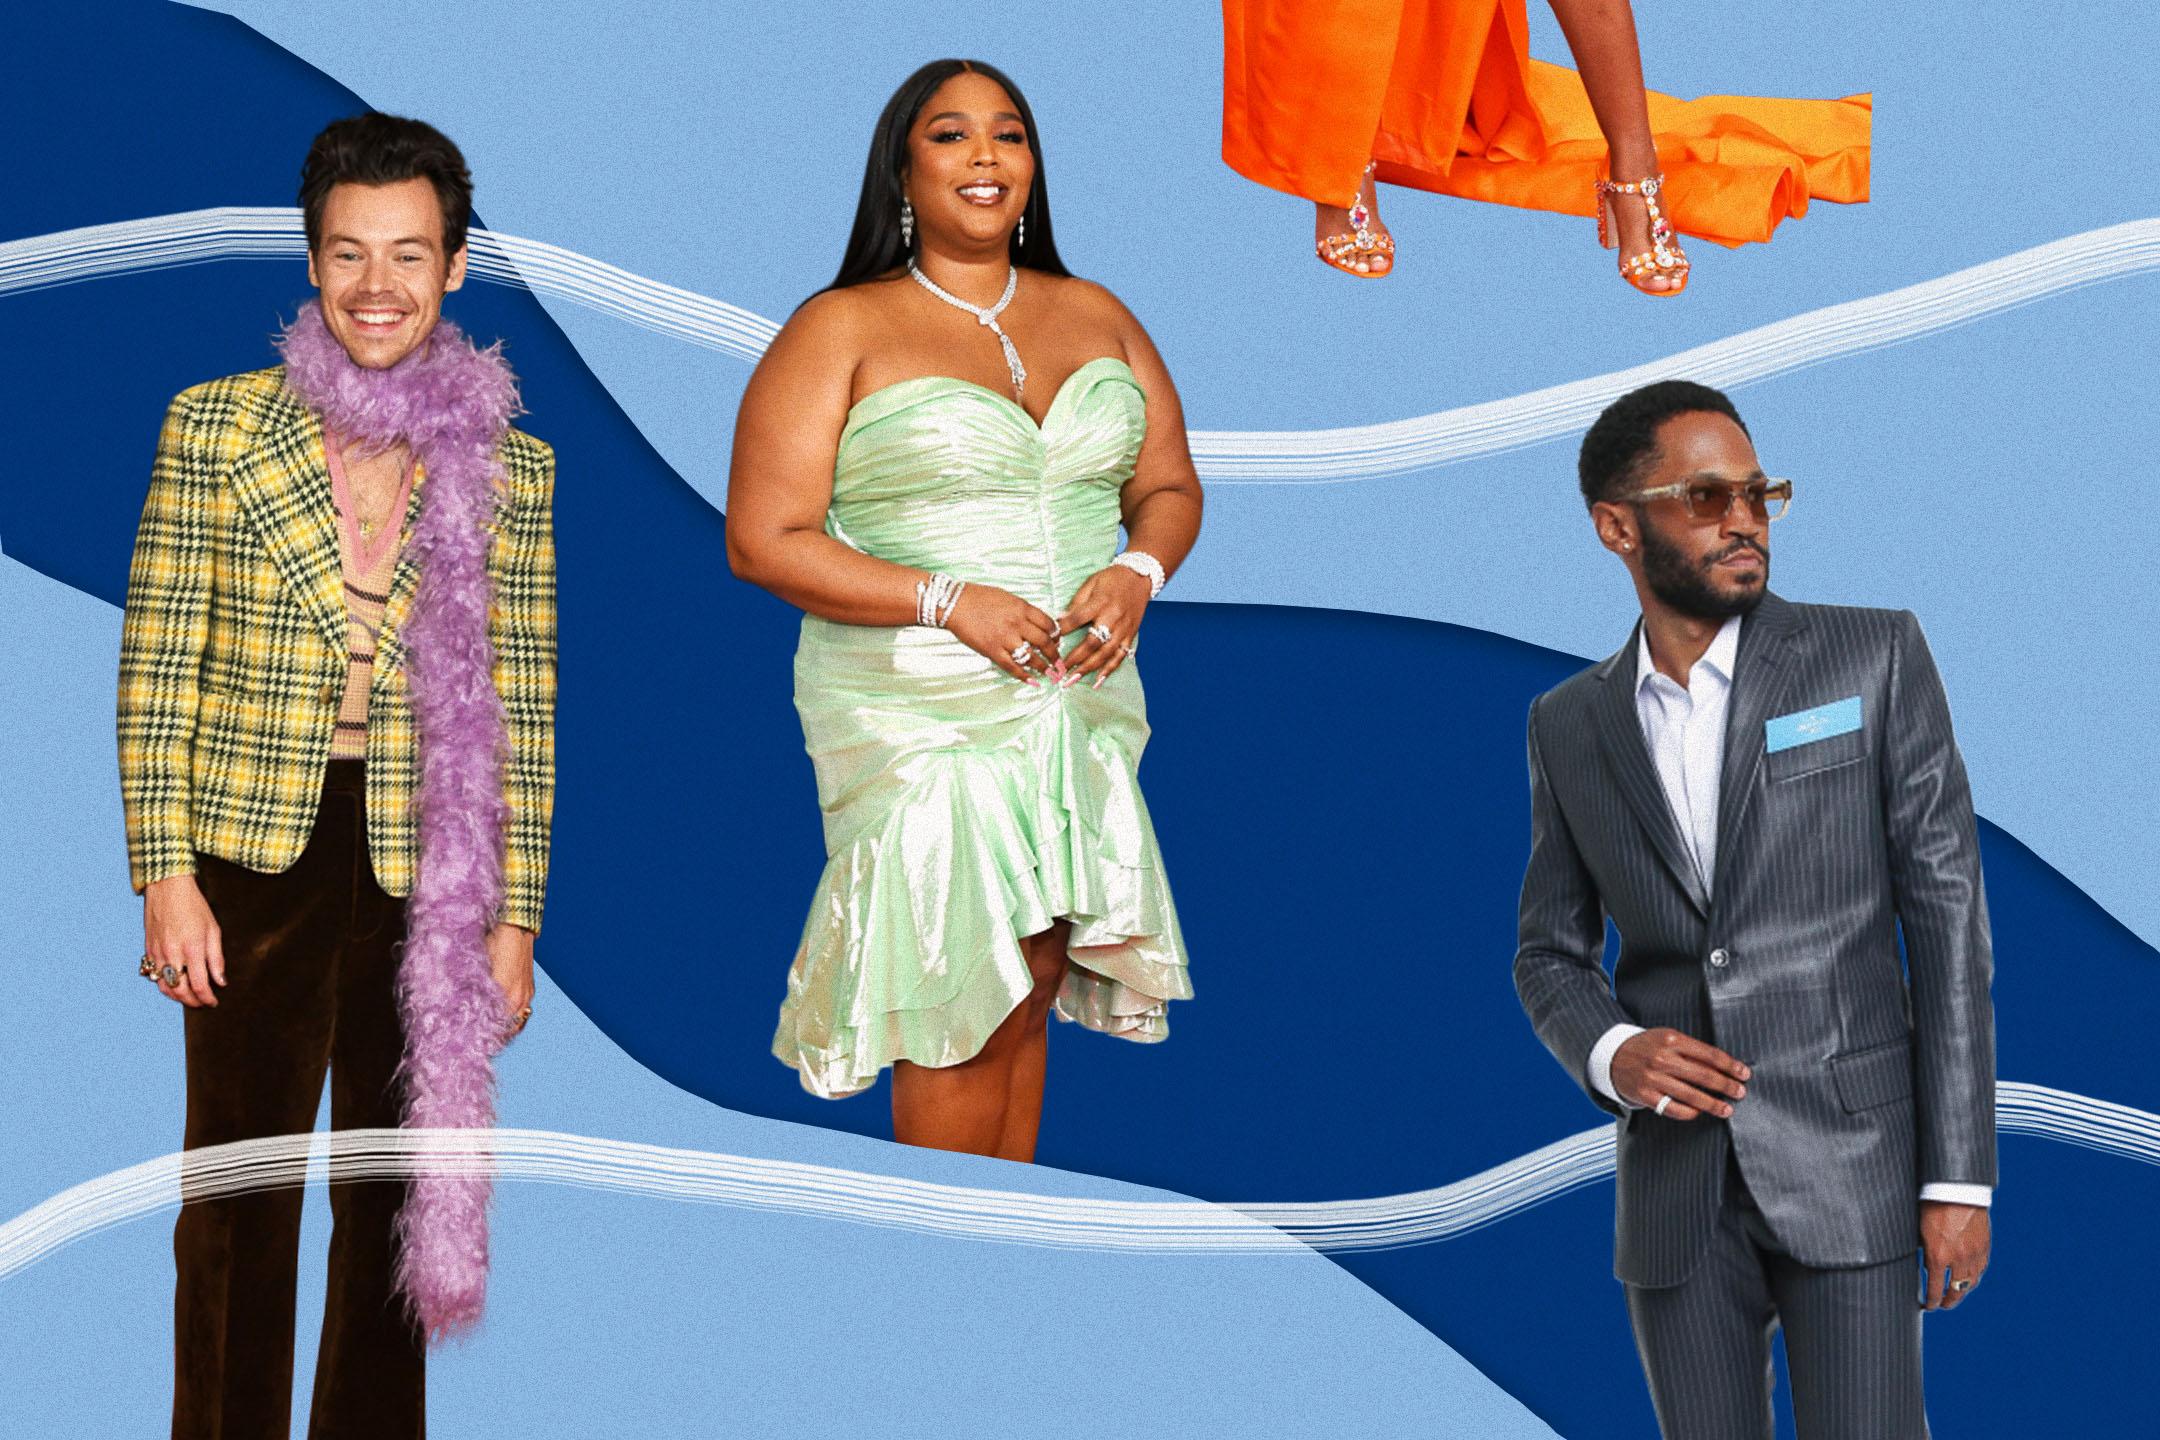 Grammys Red Carpet Fashion Style Looks: Dua Lipa, Megan Thee Stallion  WWD